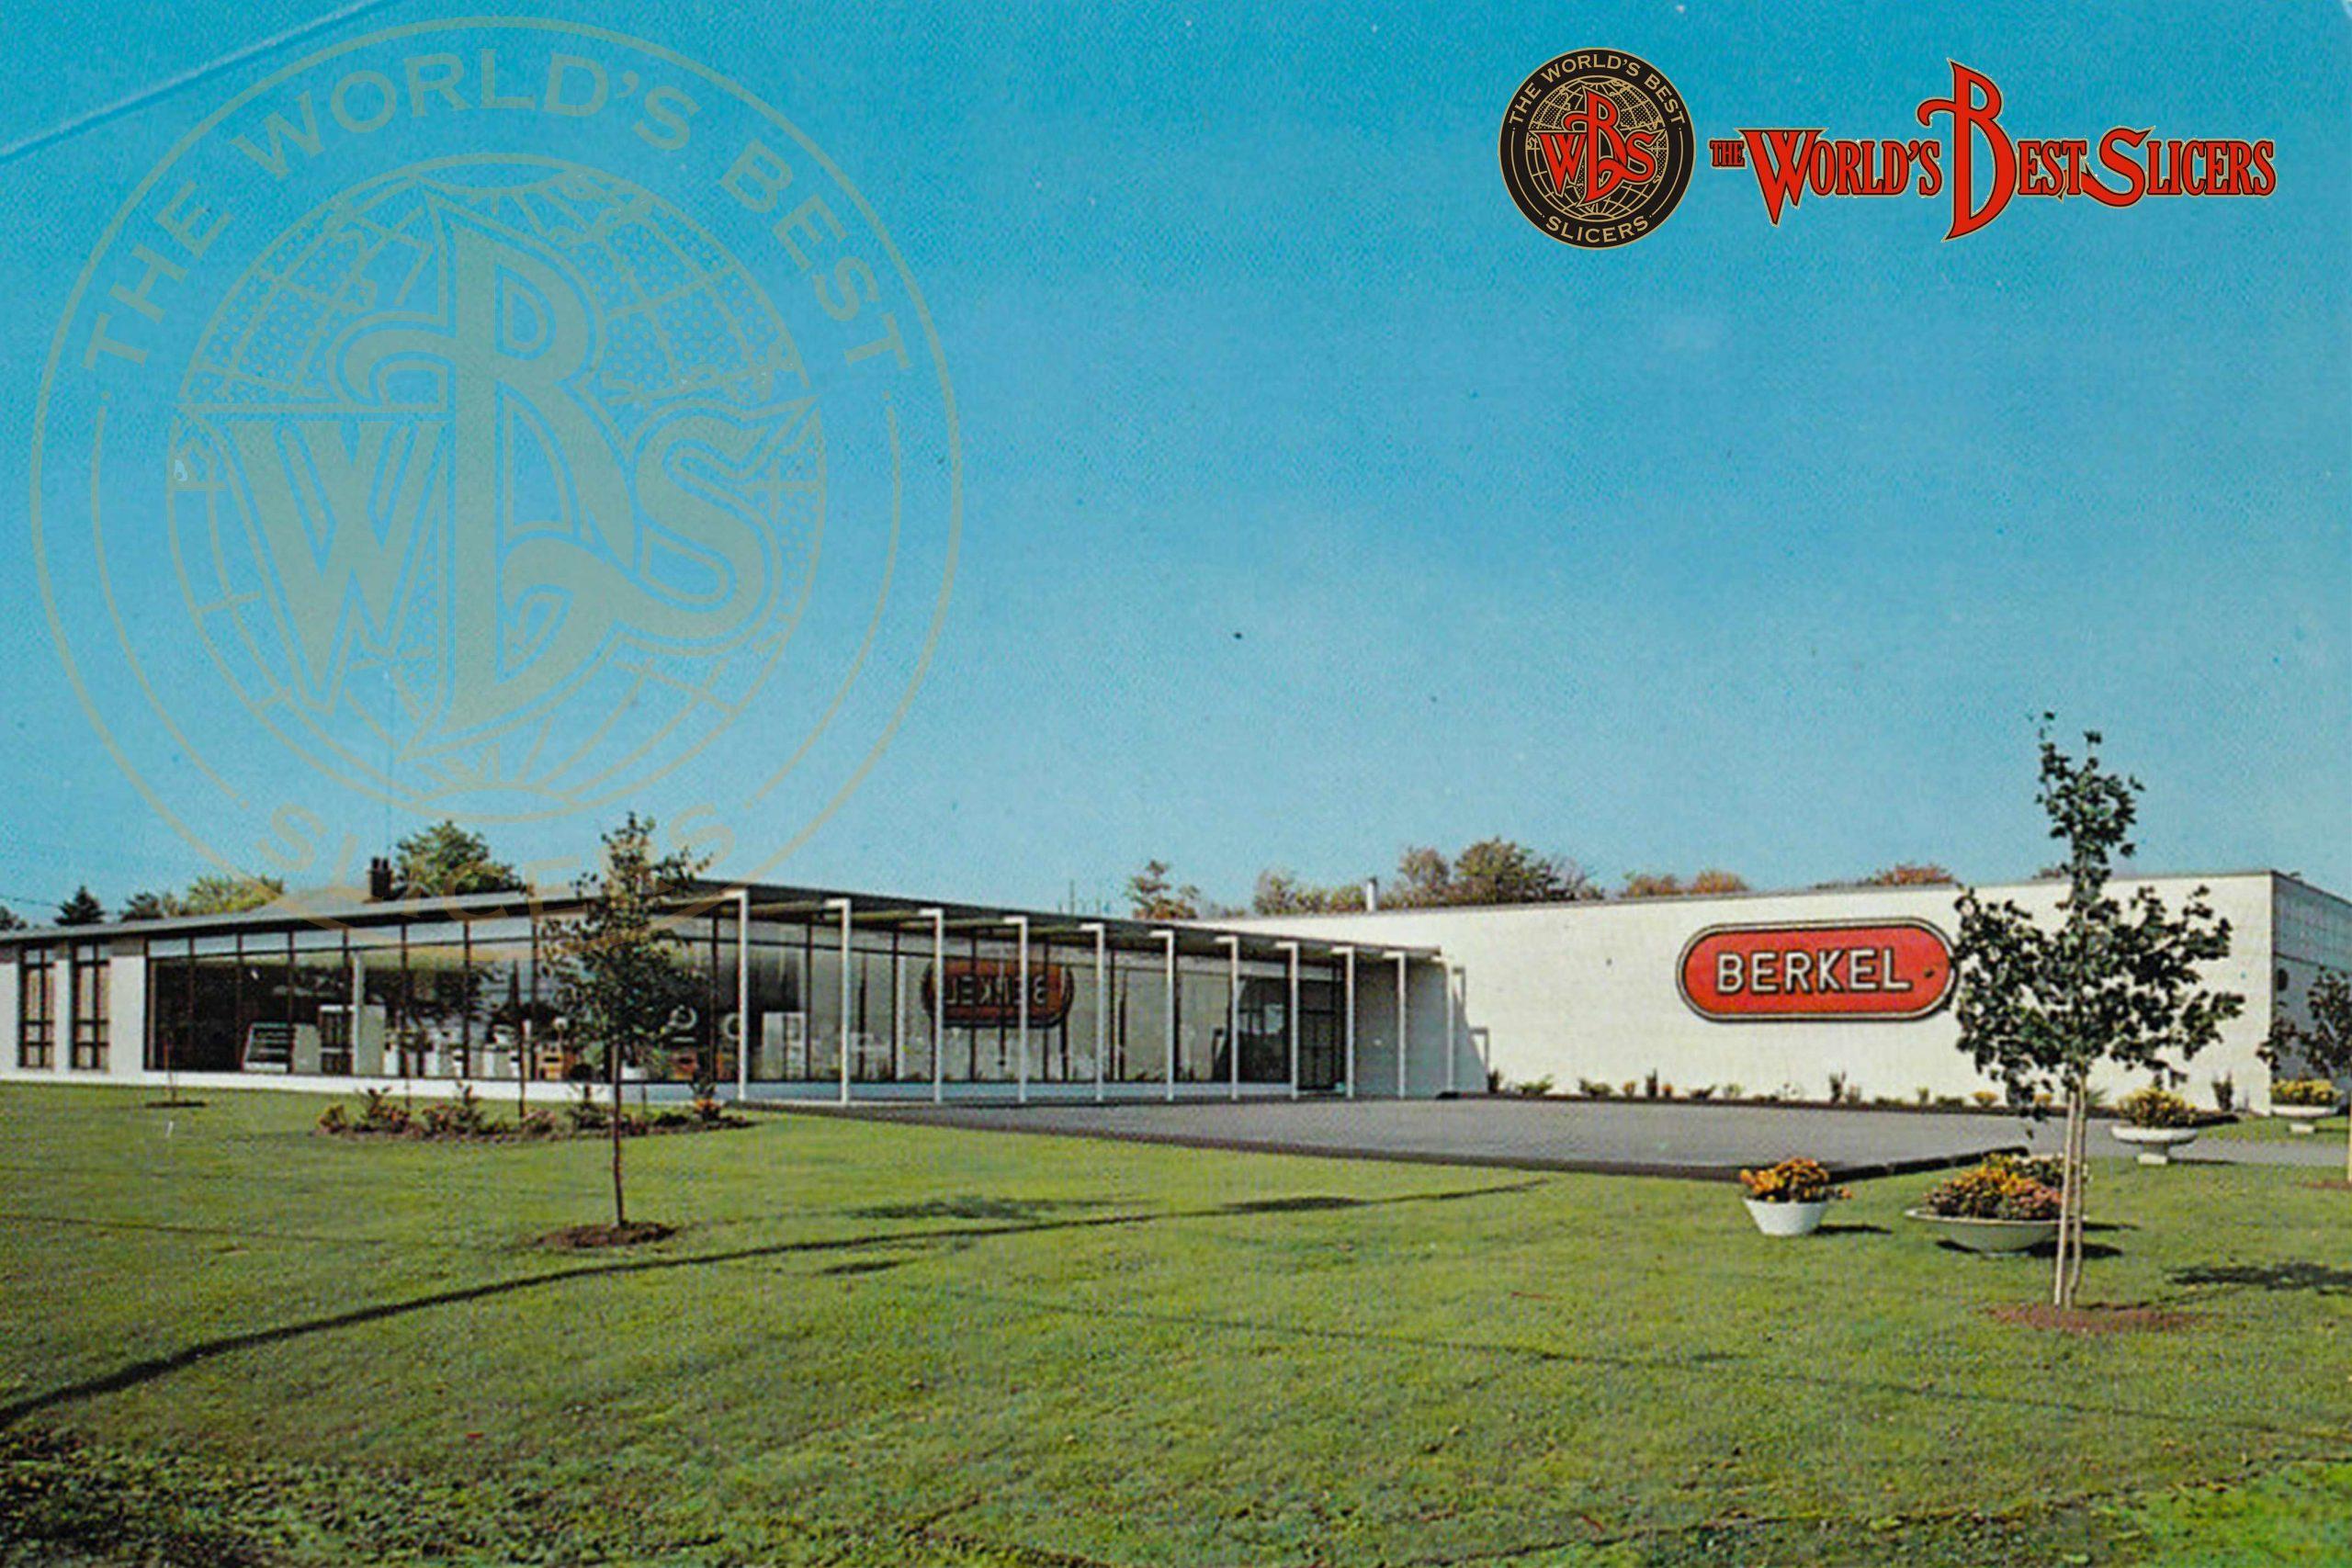 HP0108-scaled W.A.Van Berkel's Geschichte